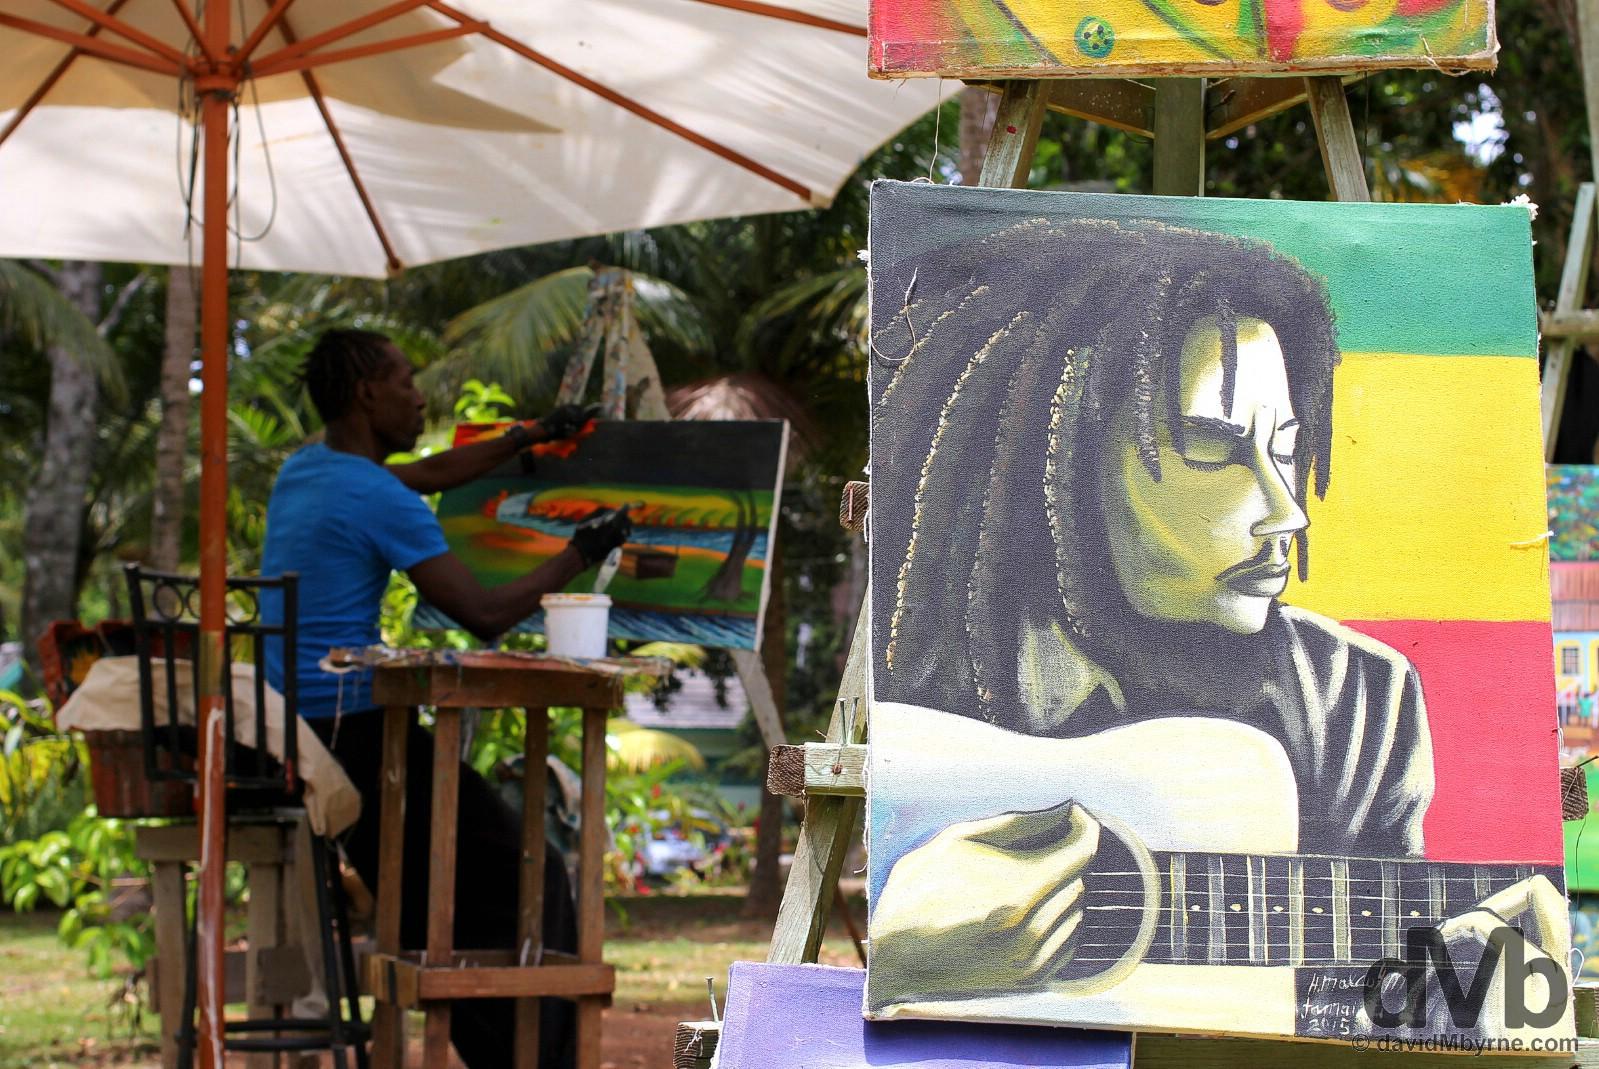 An artist at Dunn's River Falls, Jamaica. May 15, 2015.